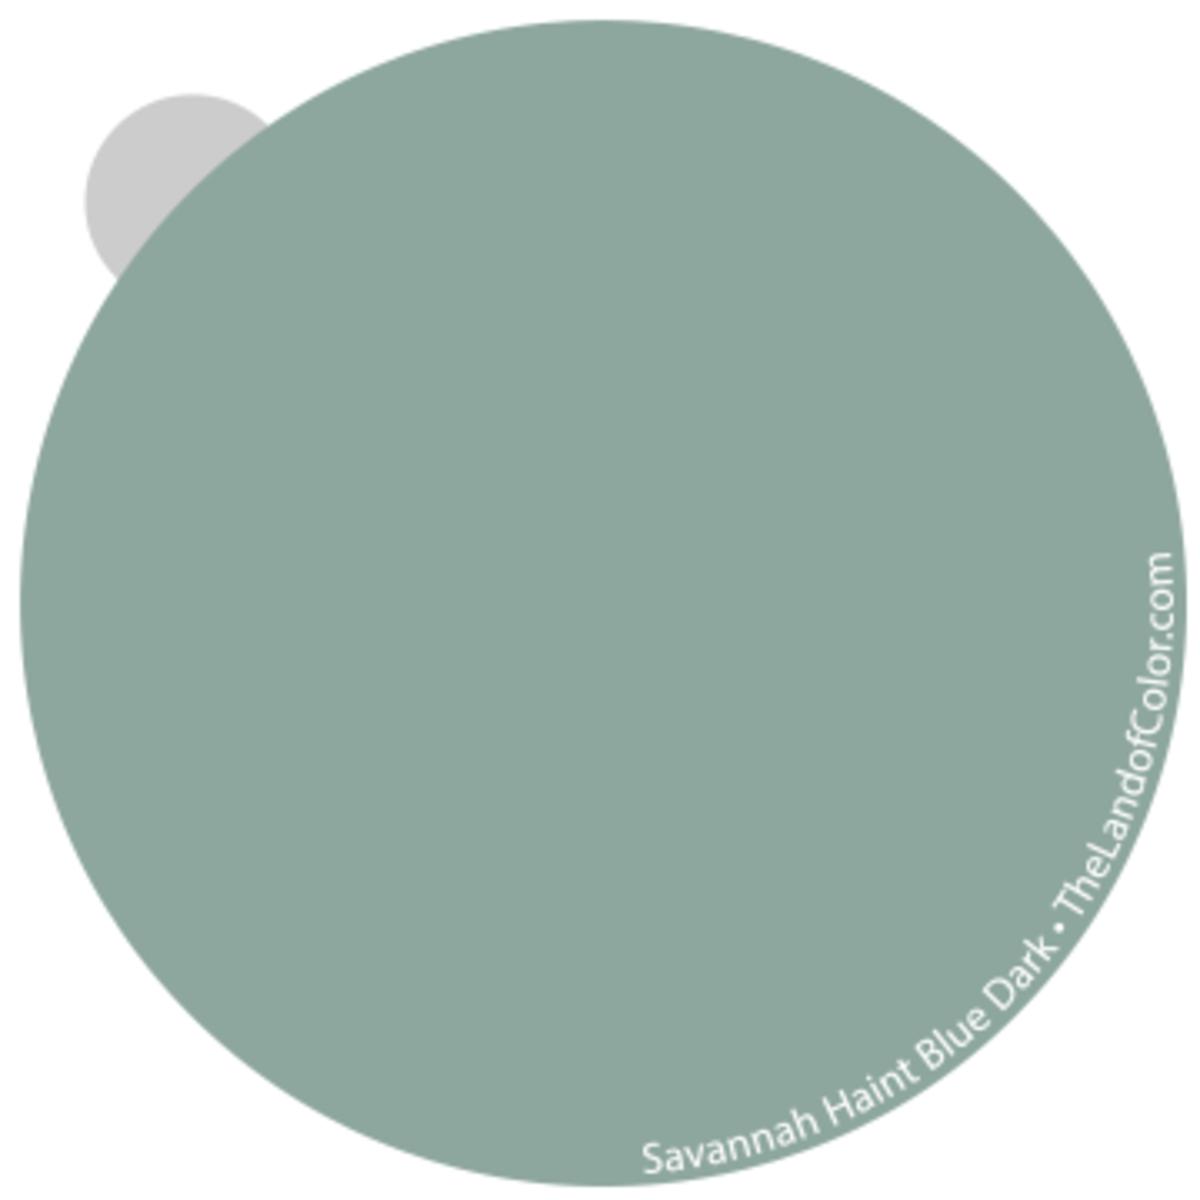 Savannah Haint Blue - Dark Strong edge of greeness